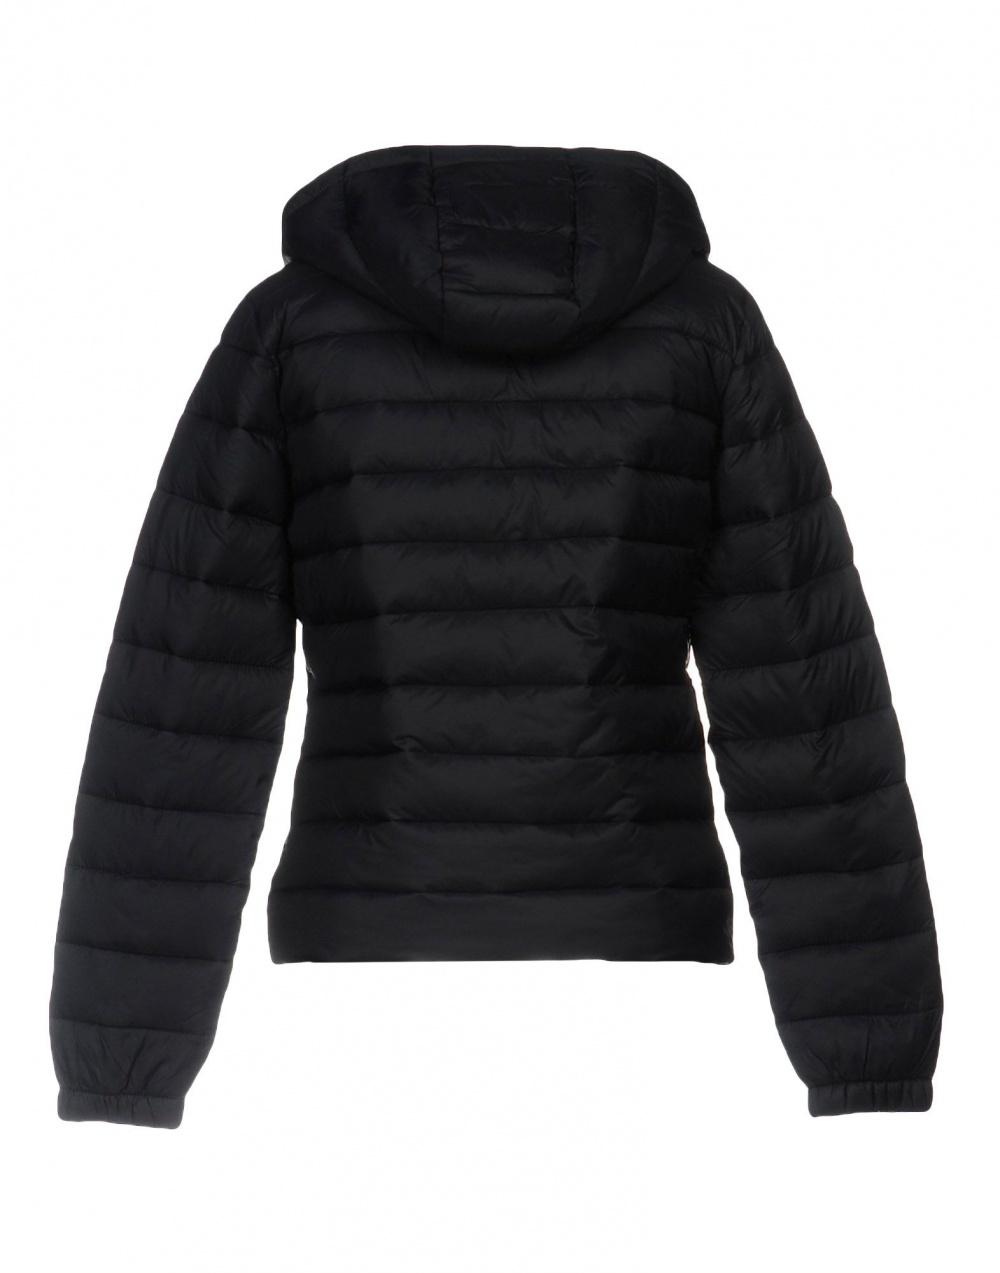 Новая куртка JACQUELINE de YONG  размер Л